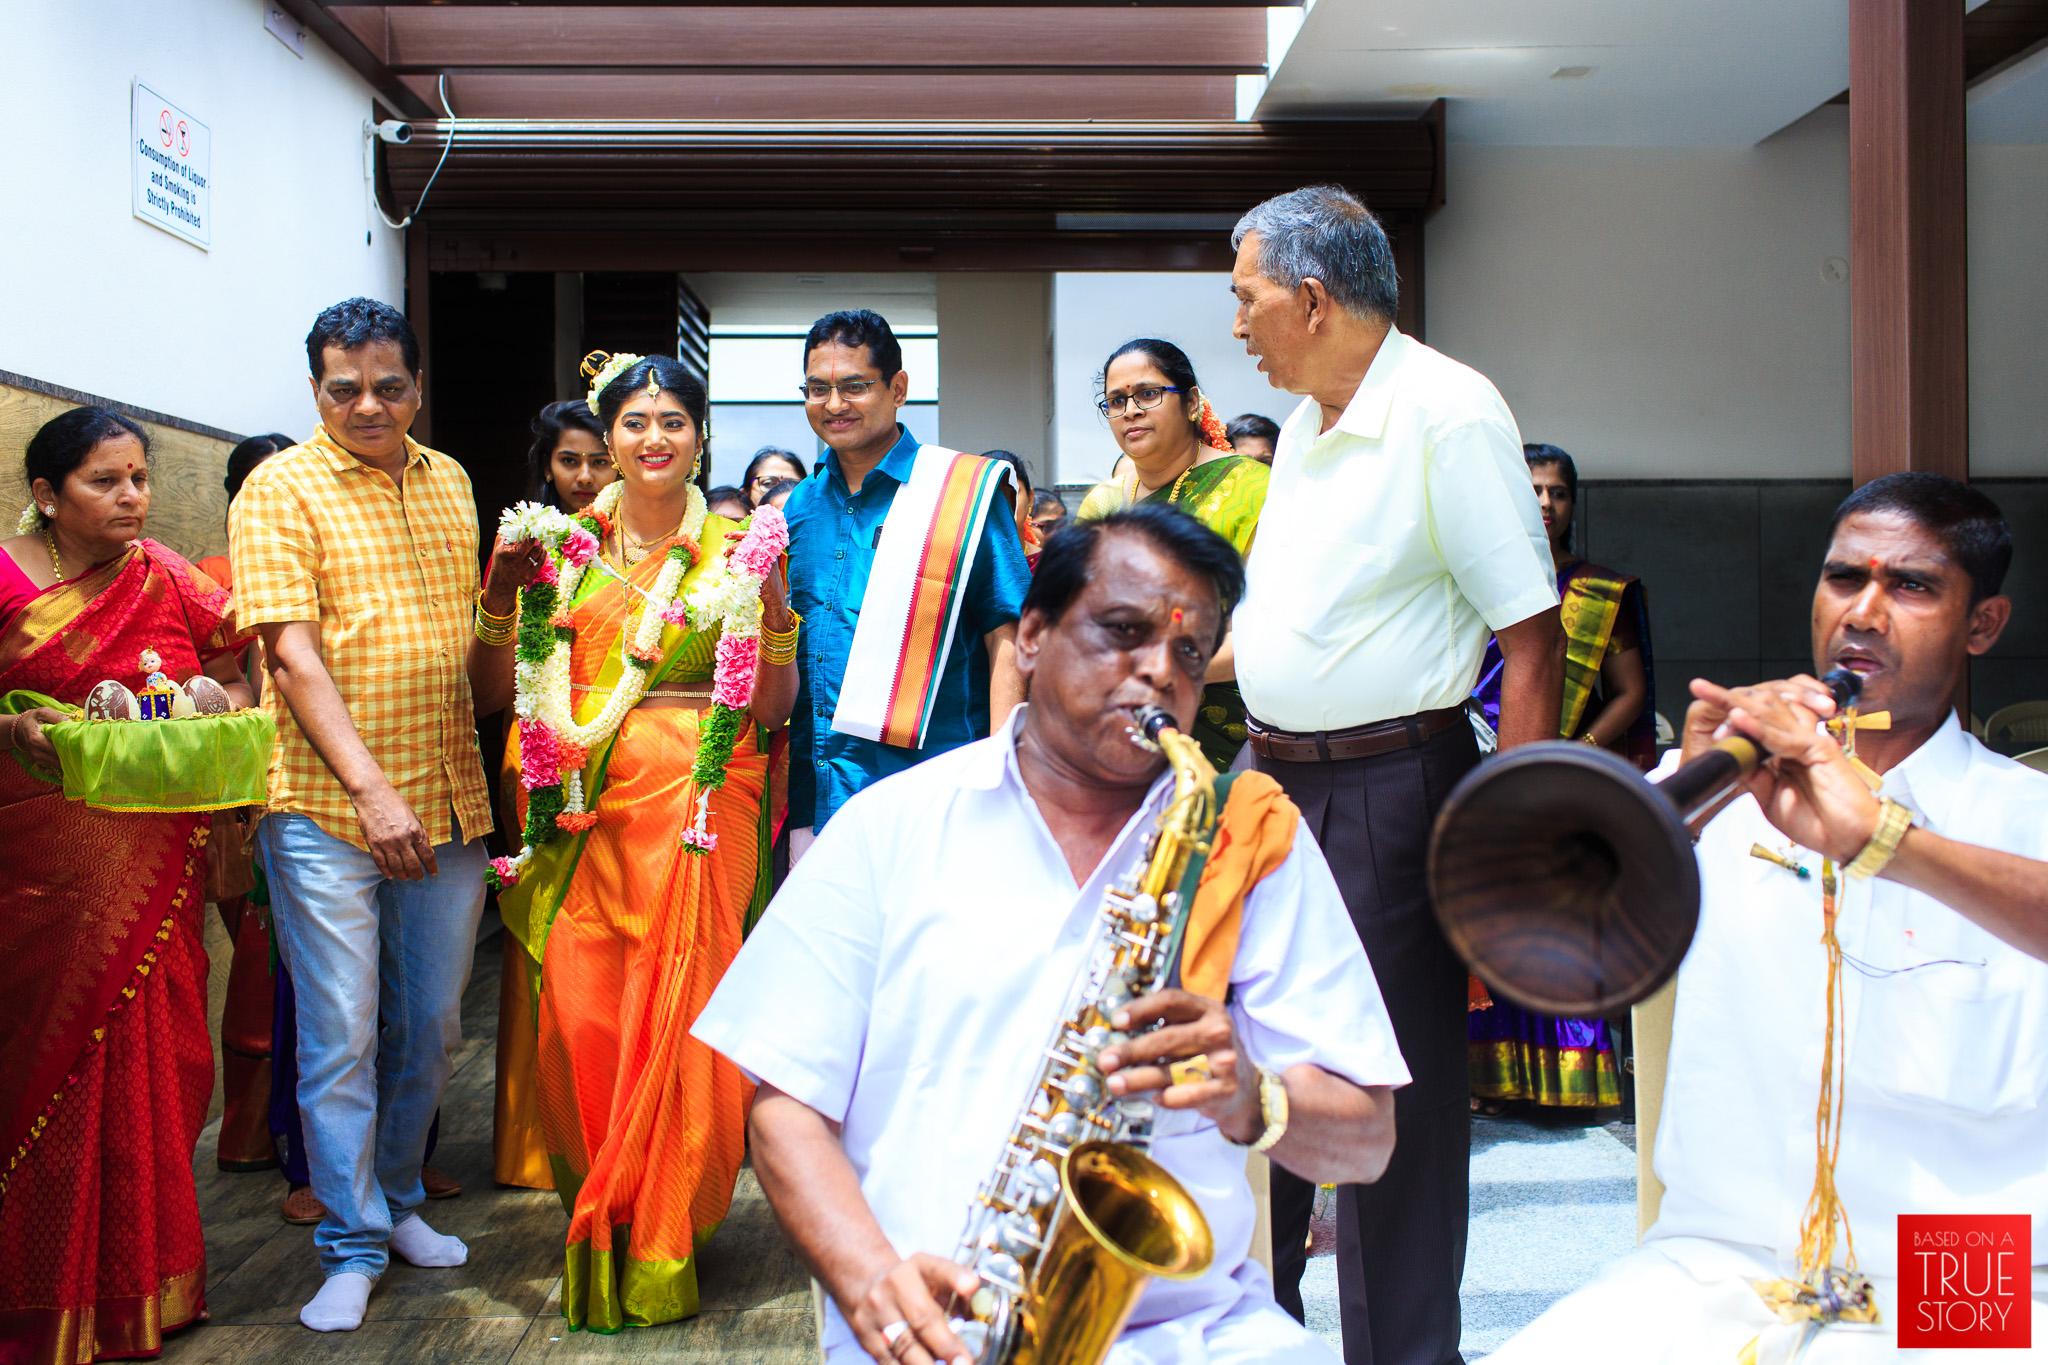 Tambrahm-Candid-Wedding-Photographers-Bangalore-0049.jpg